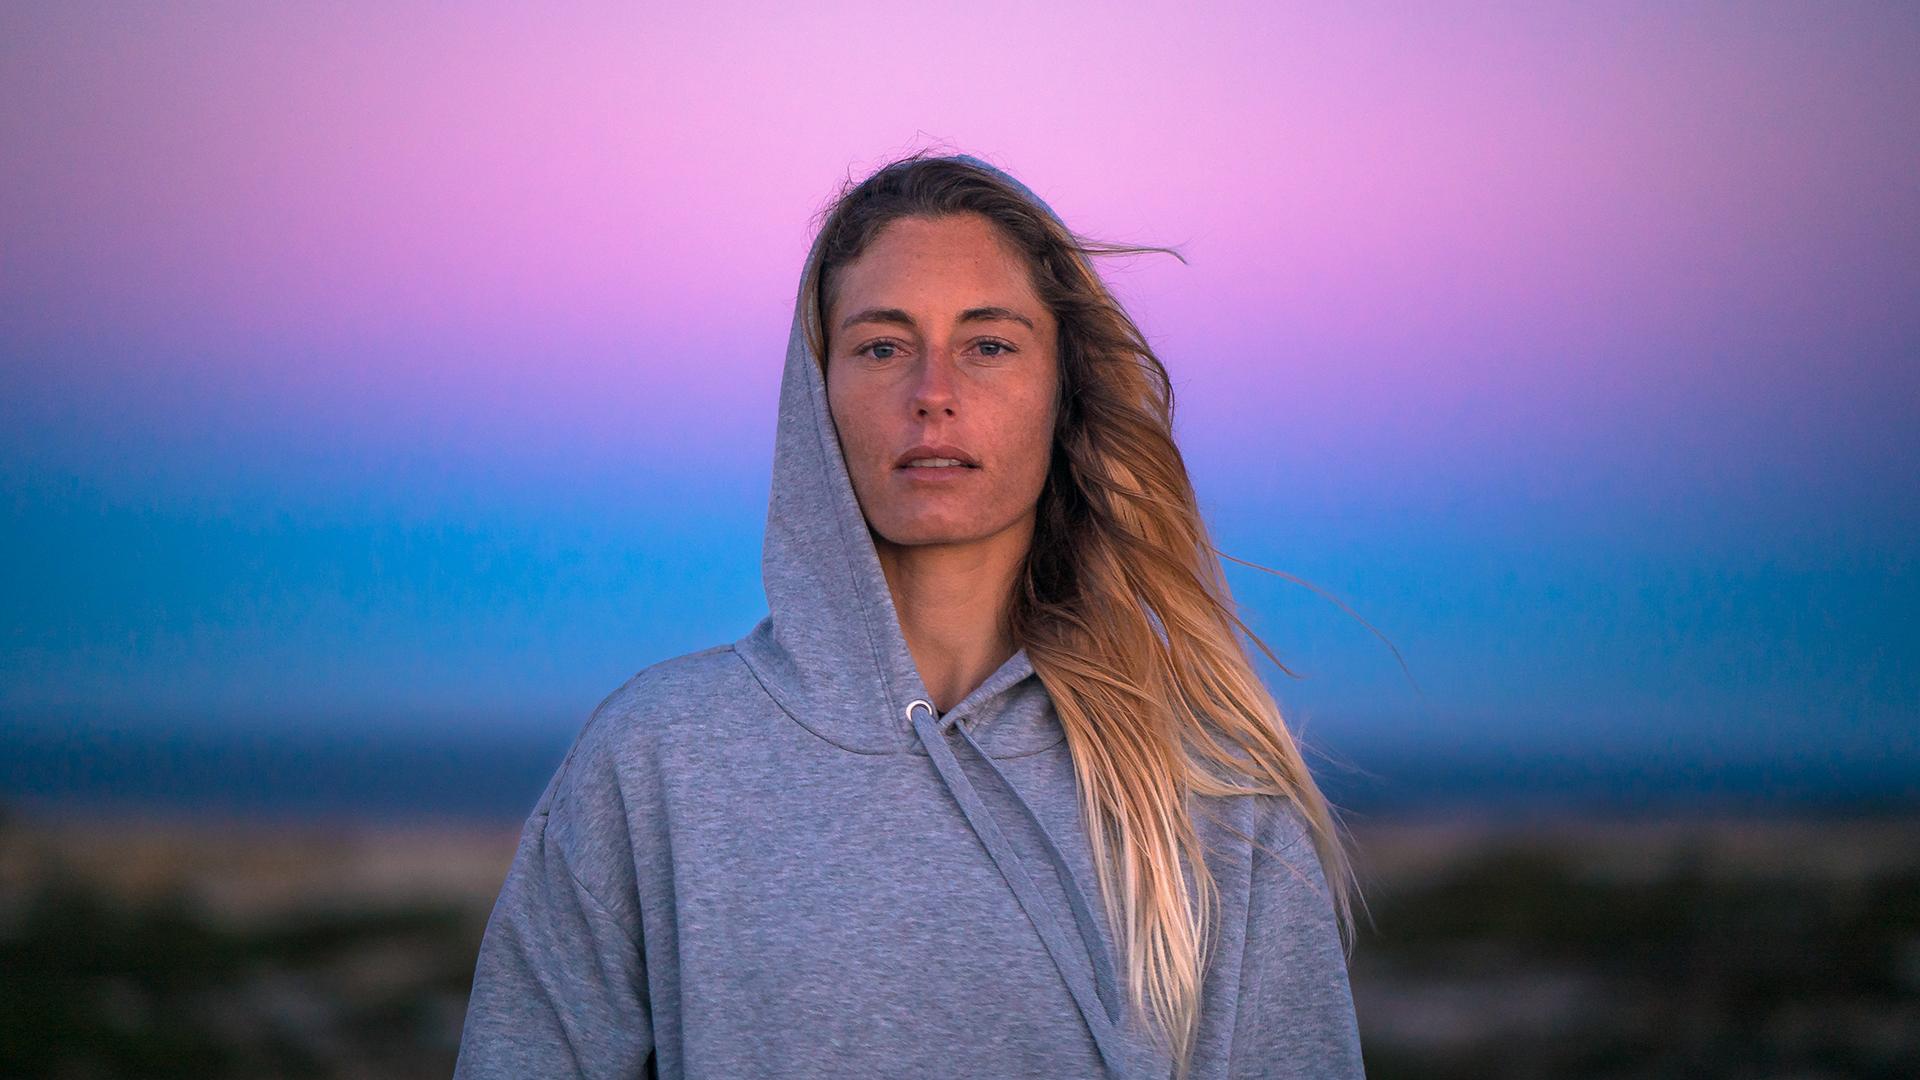 Skin Protect, Ocean Respect - Joana Schenker